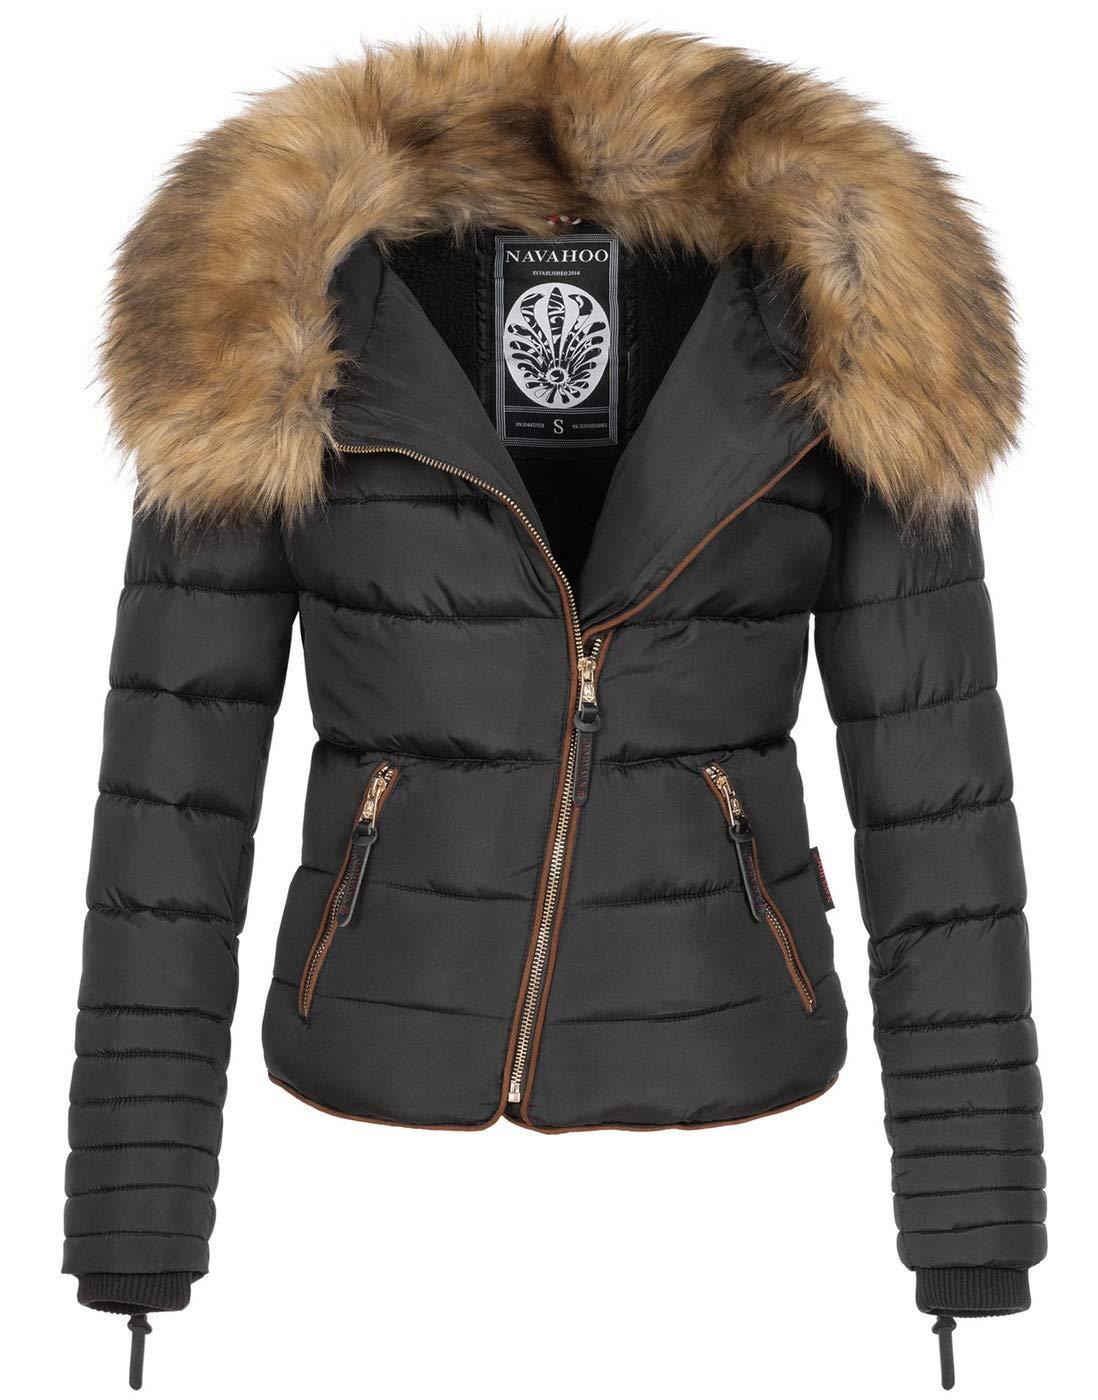 Navahoo Damen Winter Jacke Parka Steppjacke großer Kunstfell Kragen B835